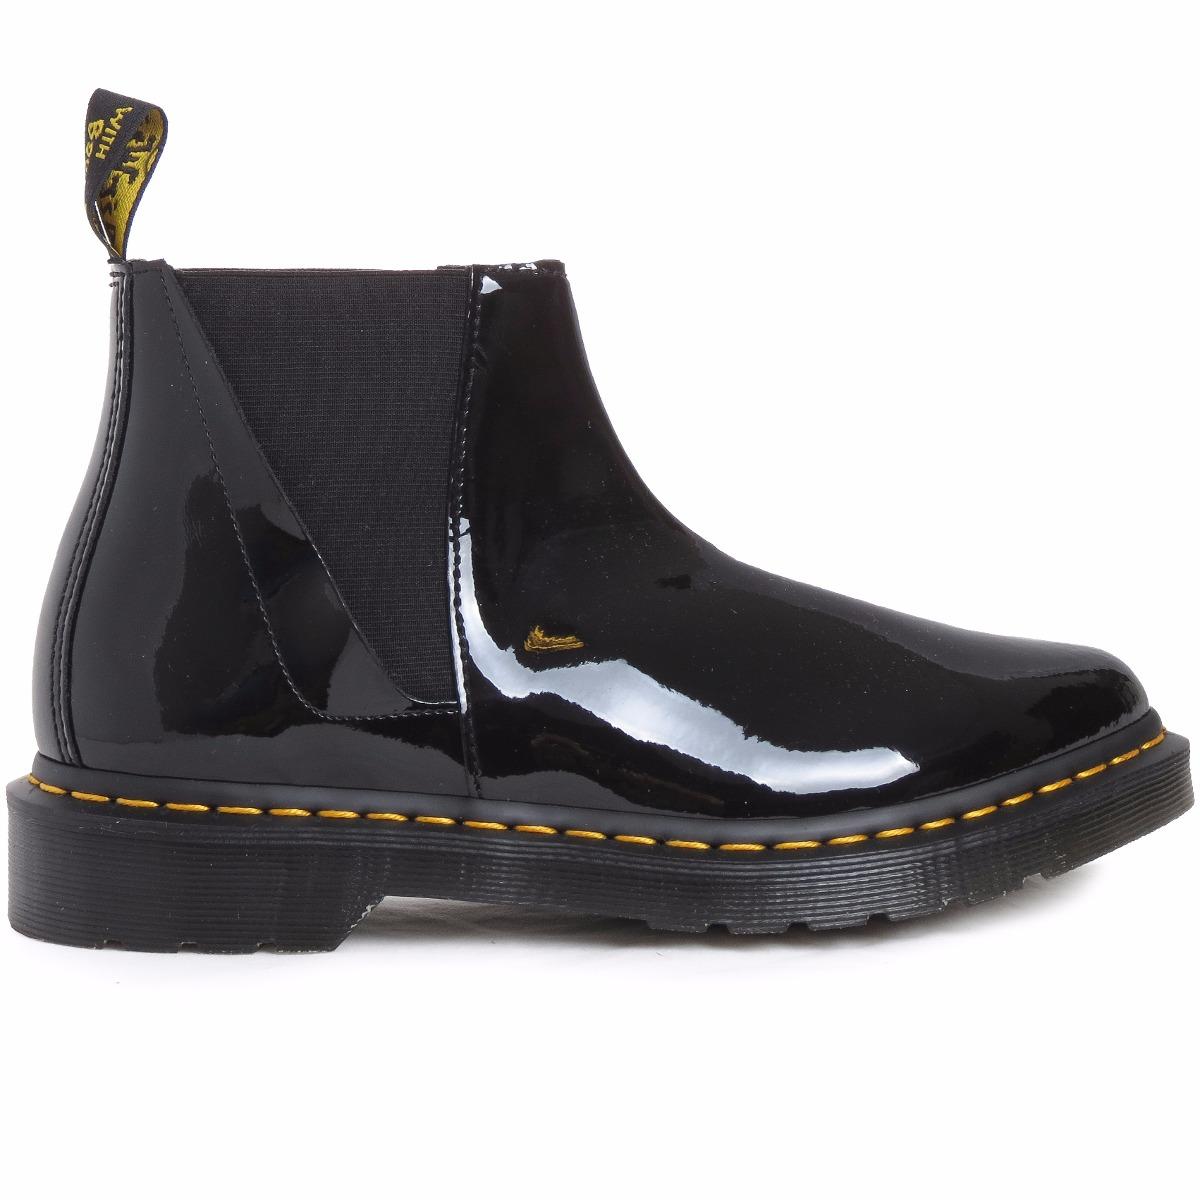 04d2edc59b5b0 Cargando zoom... martens mujer zapatos bota. Cargando zoom... zapatos bota  media dr martens bianca charol mujer importados